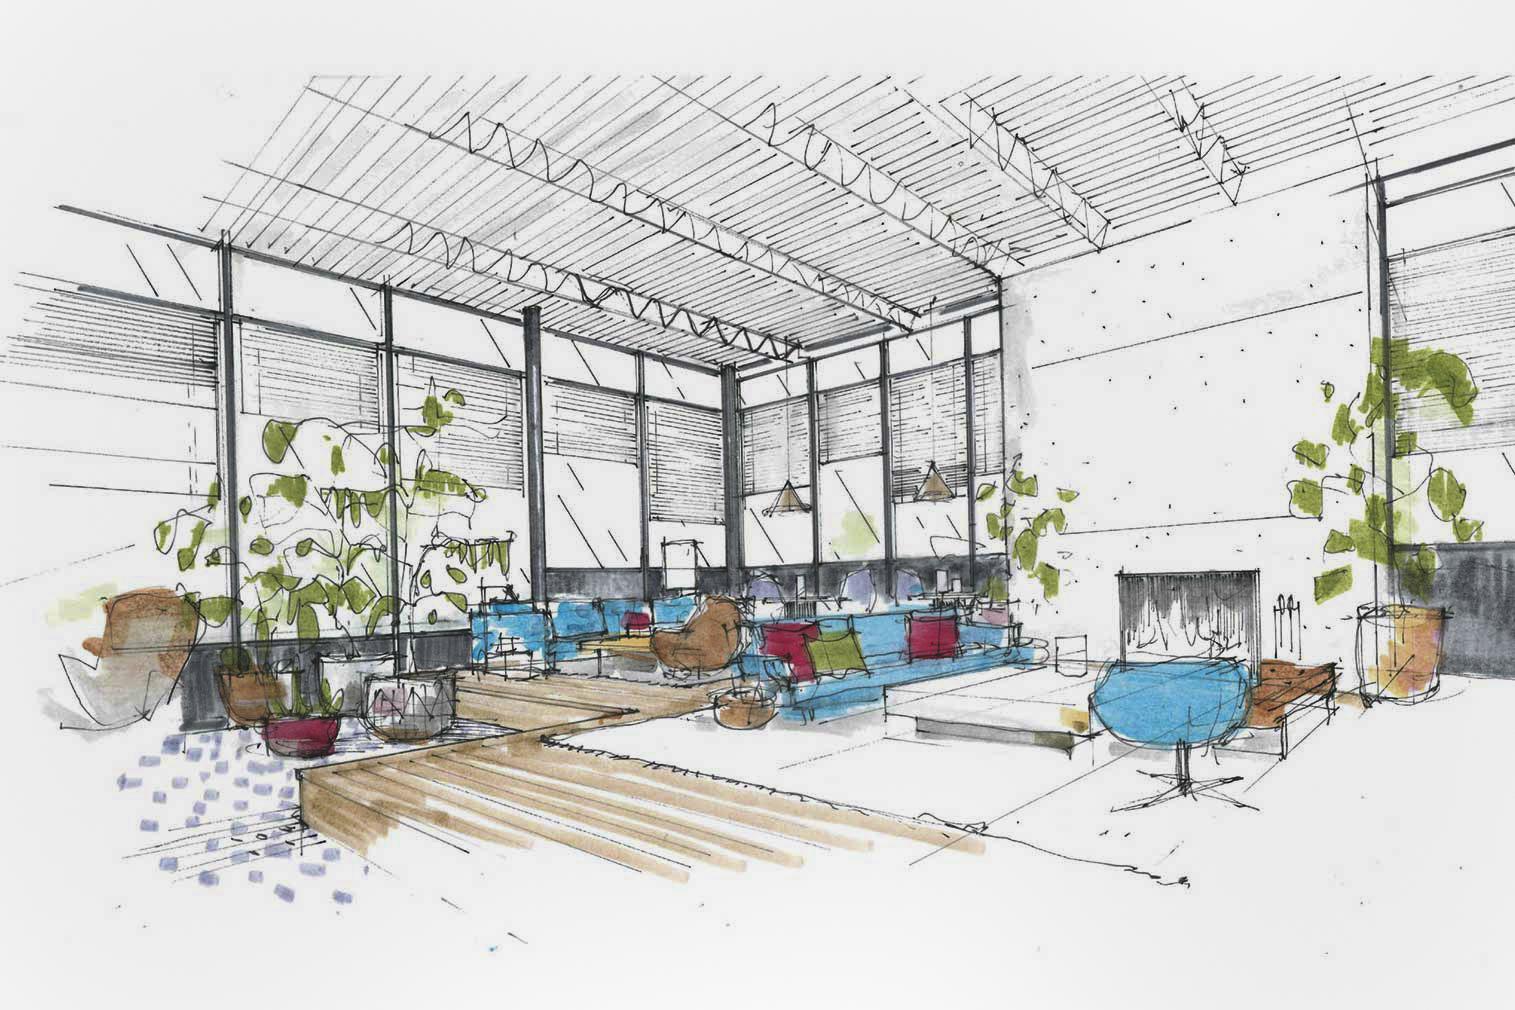 A sketch of Eaton Hotel, Washington, DC